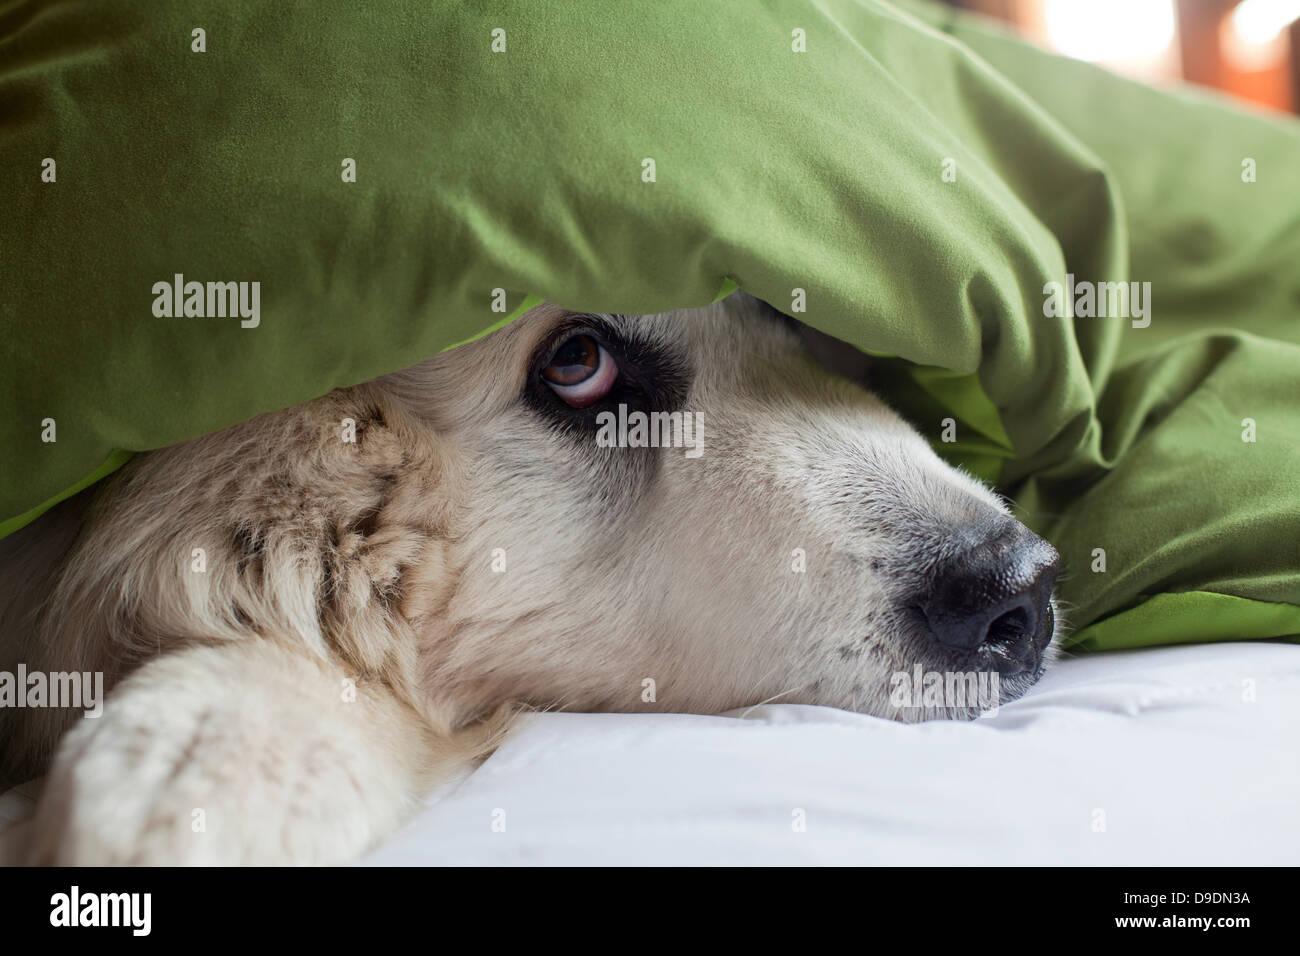 Domestic dog hiding under duvet - Stock Image